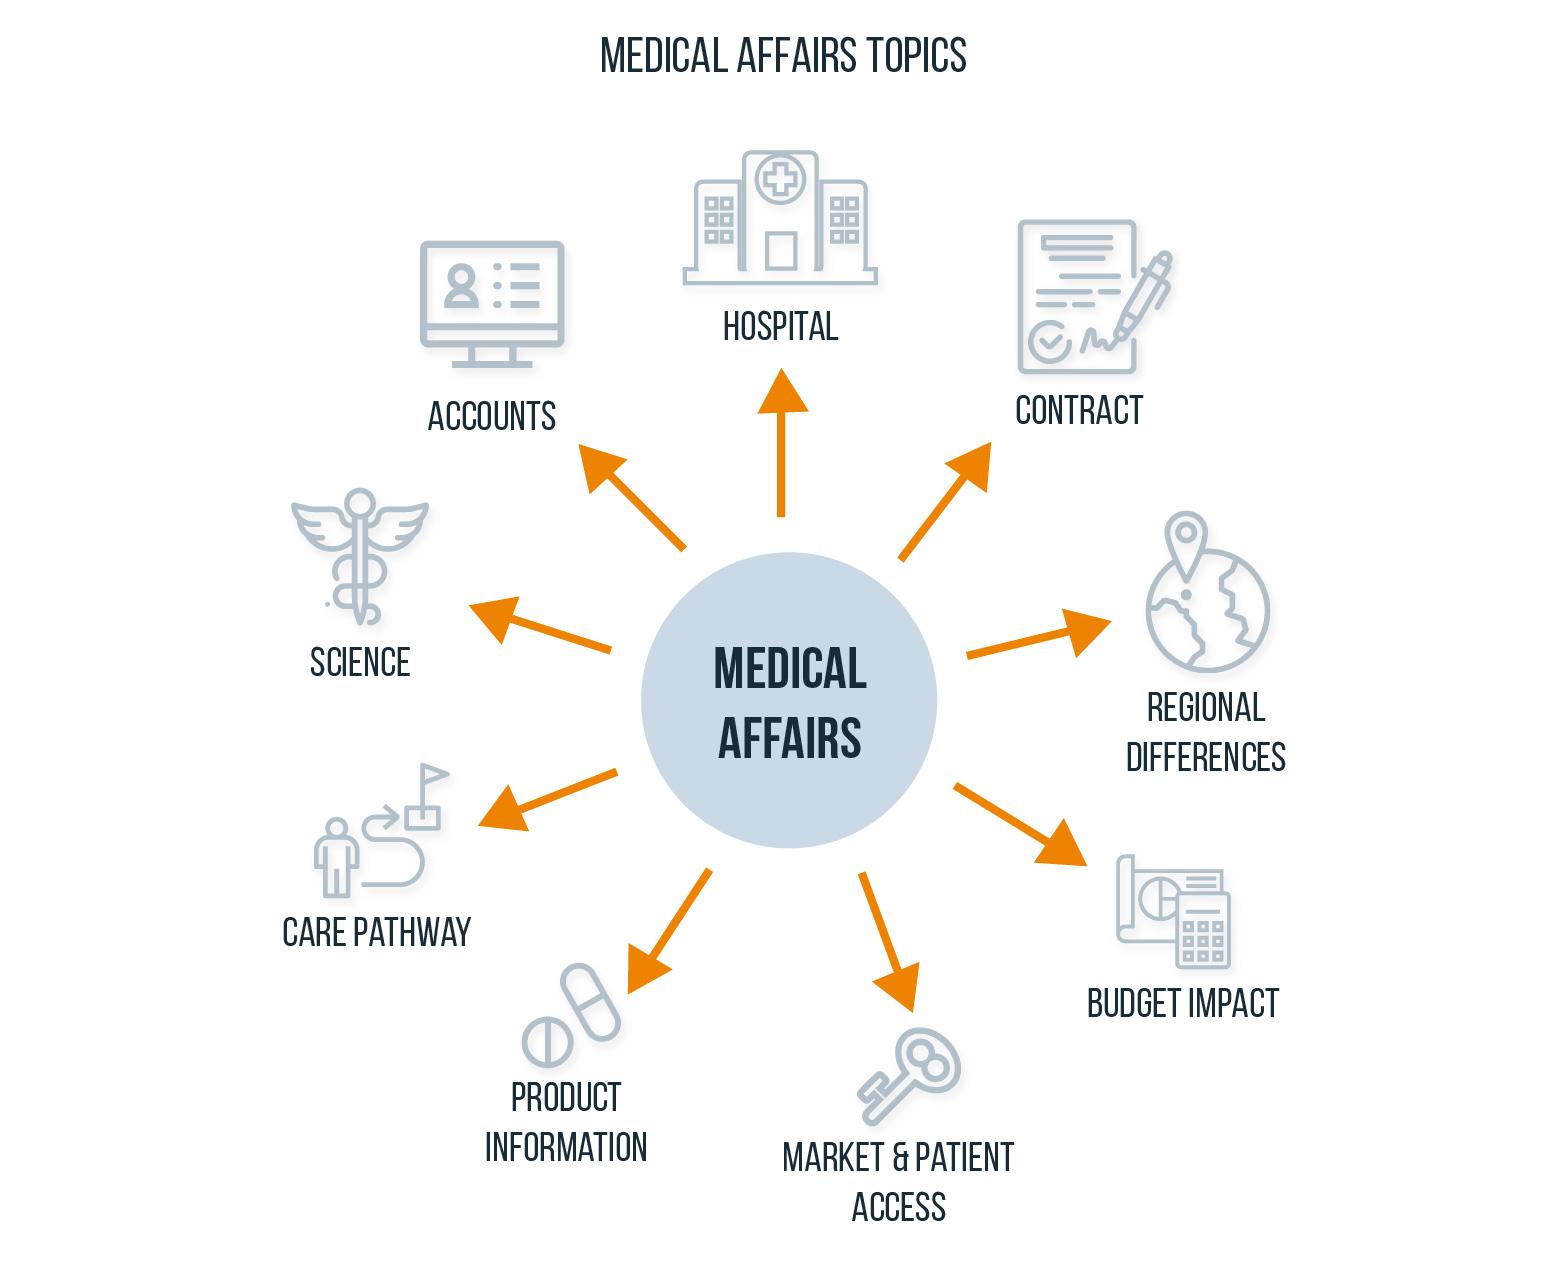 Medical Affairs topics